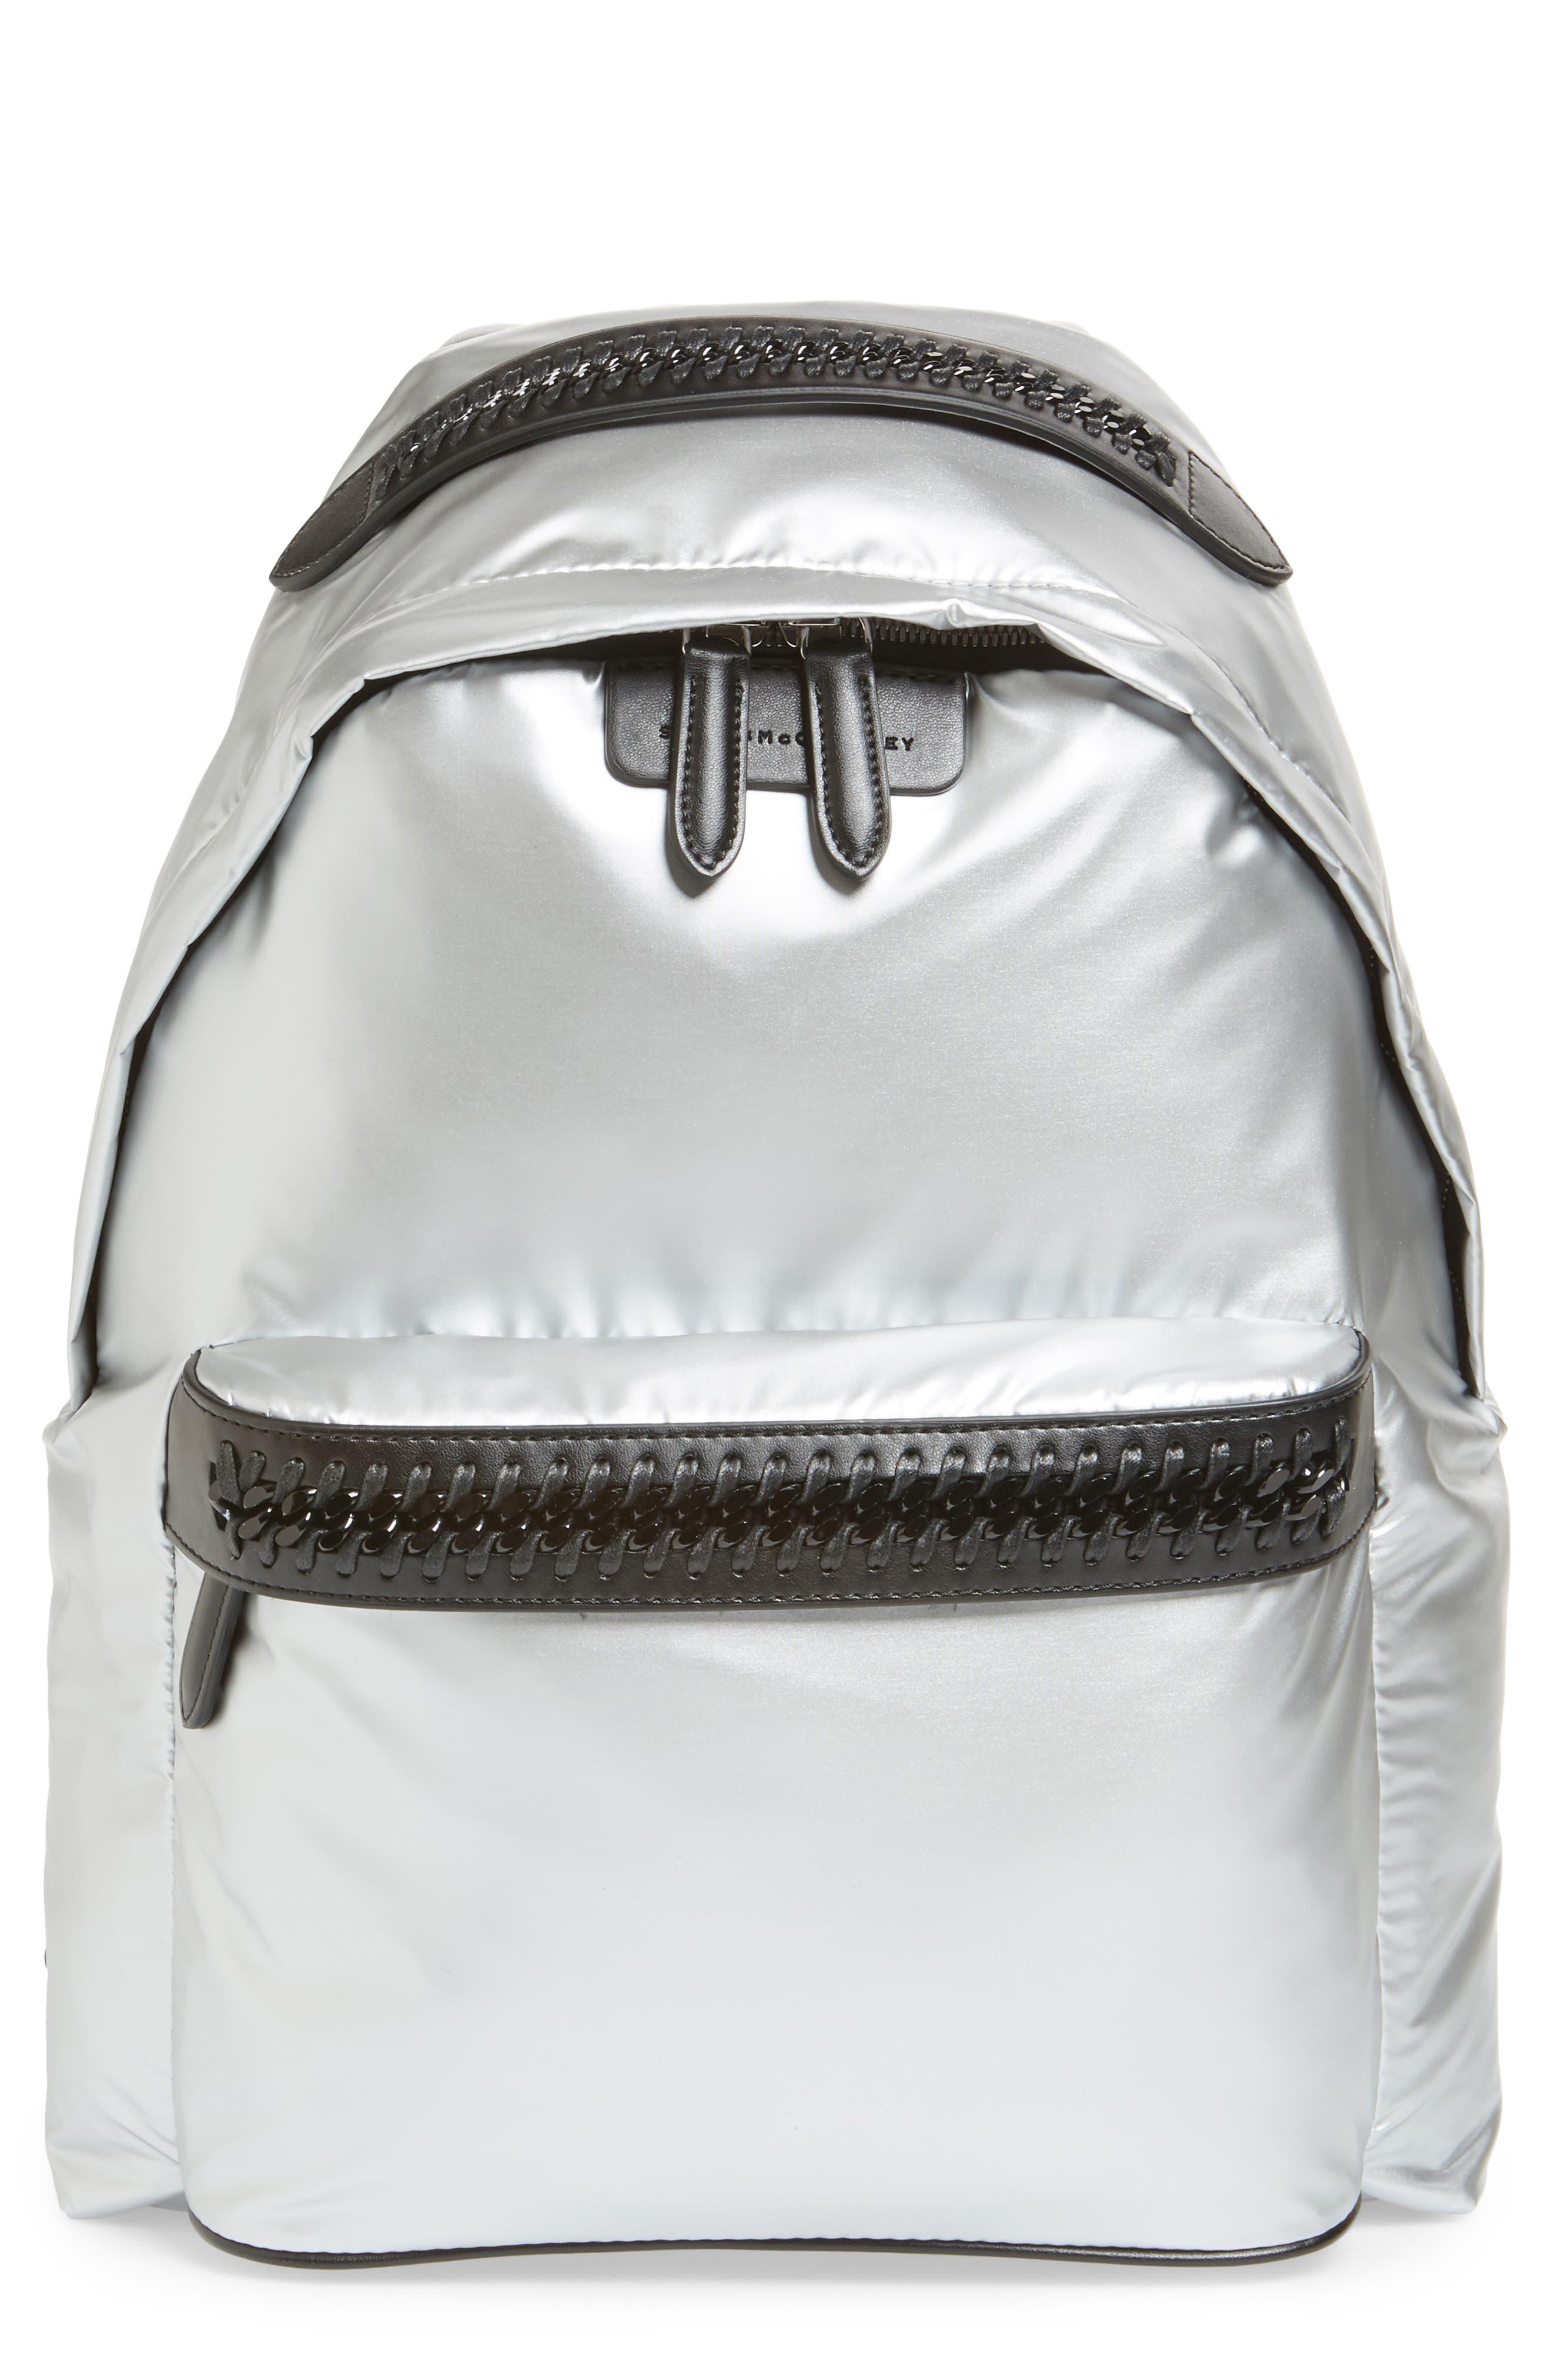 Main Image - Stella McCartney Falabella Metallic Nylon Backpack